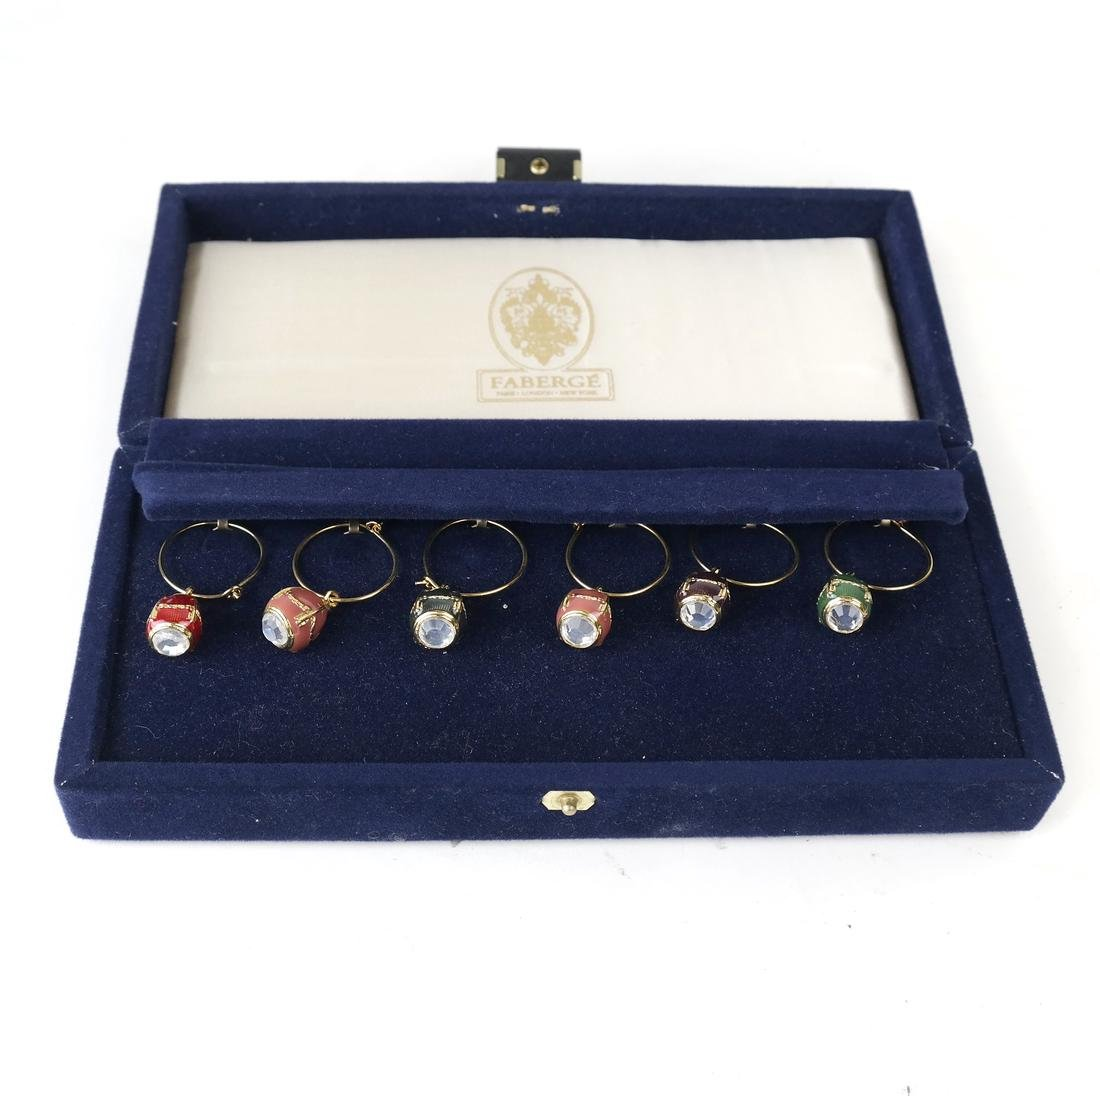 Six Wine Glass Charms, Fabergé